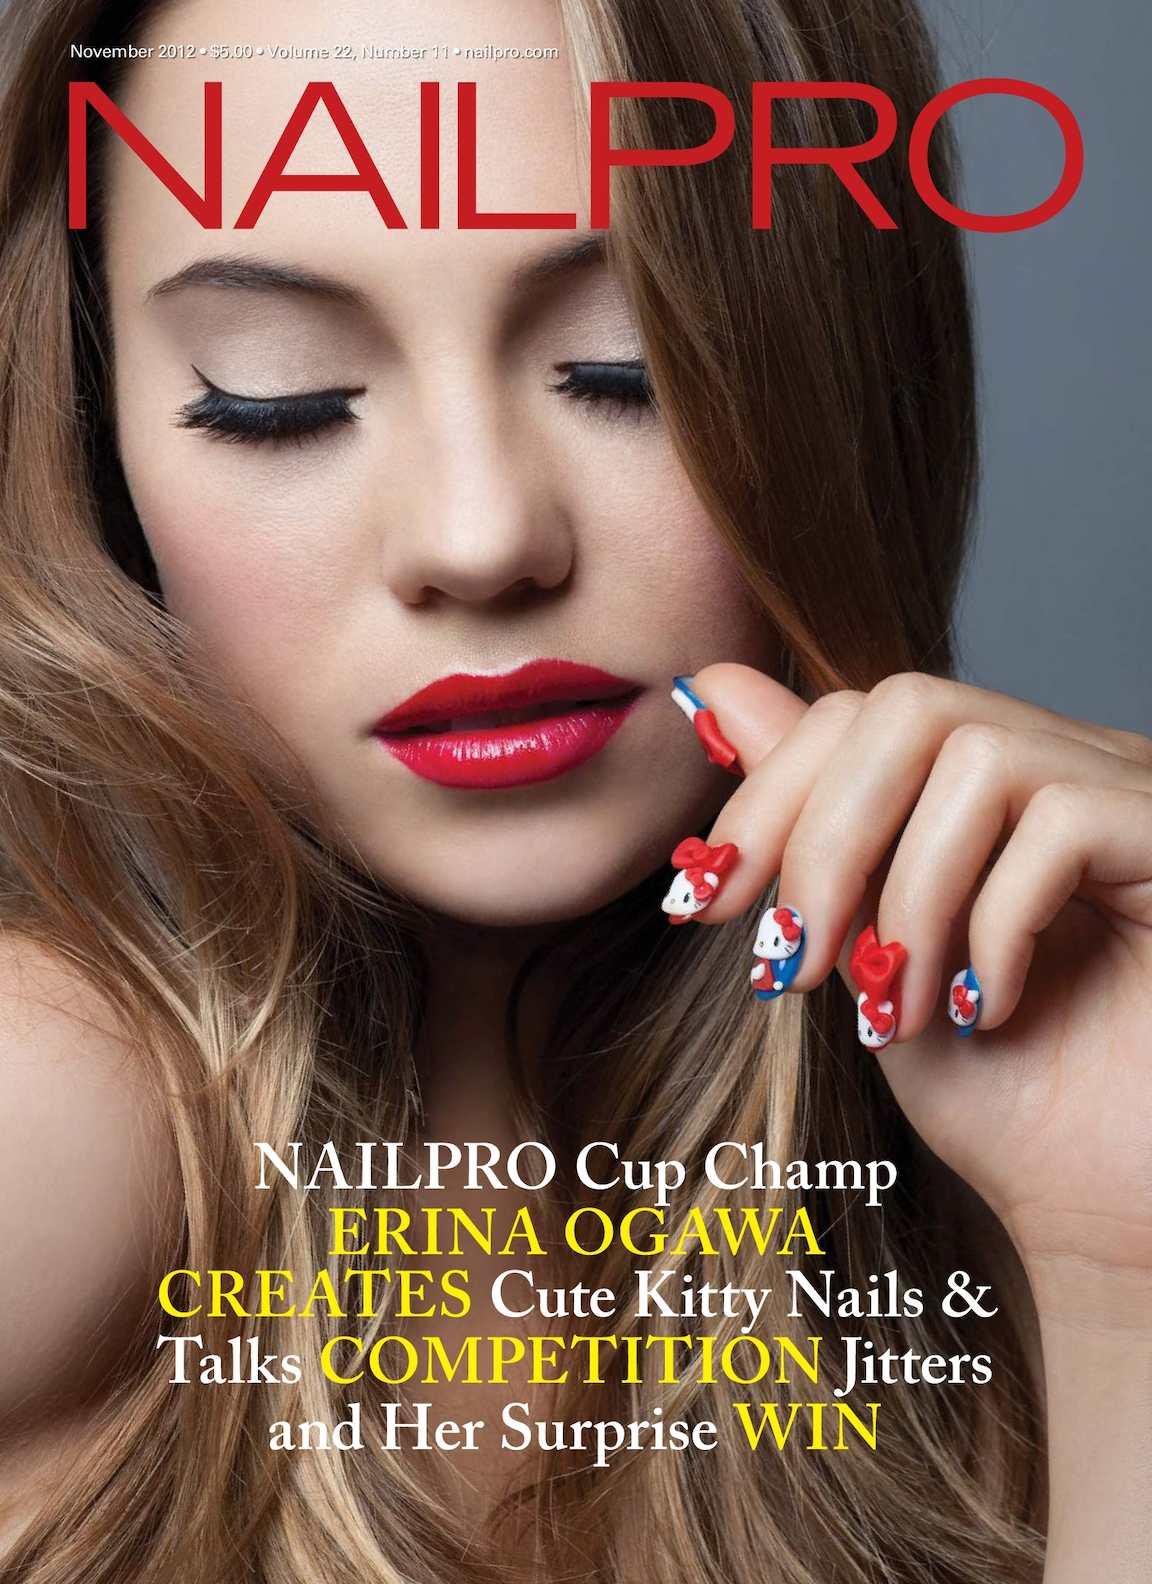 74ff83fde7 Calaméo - Nailpro 2012 11 - Wishlistpolish